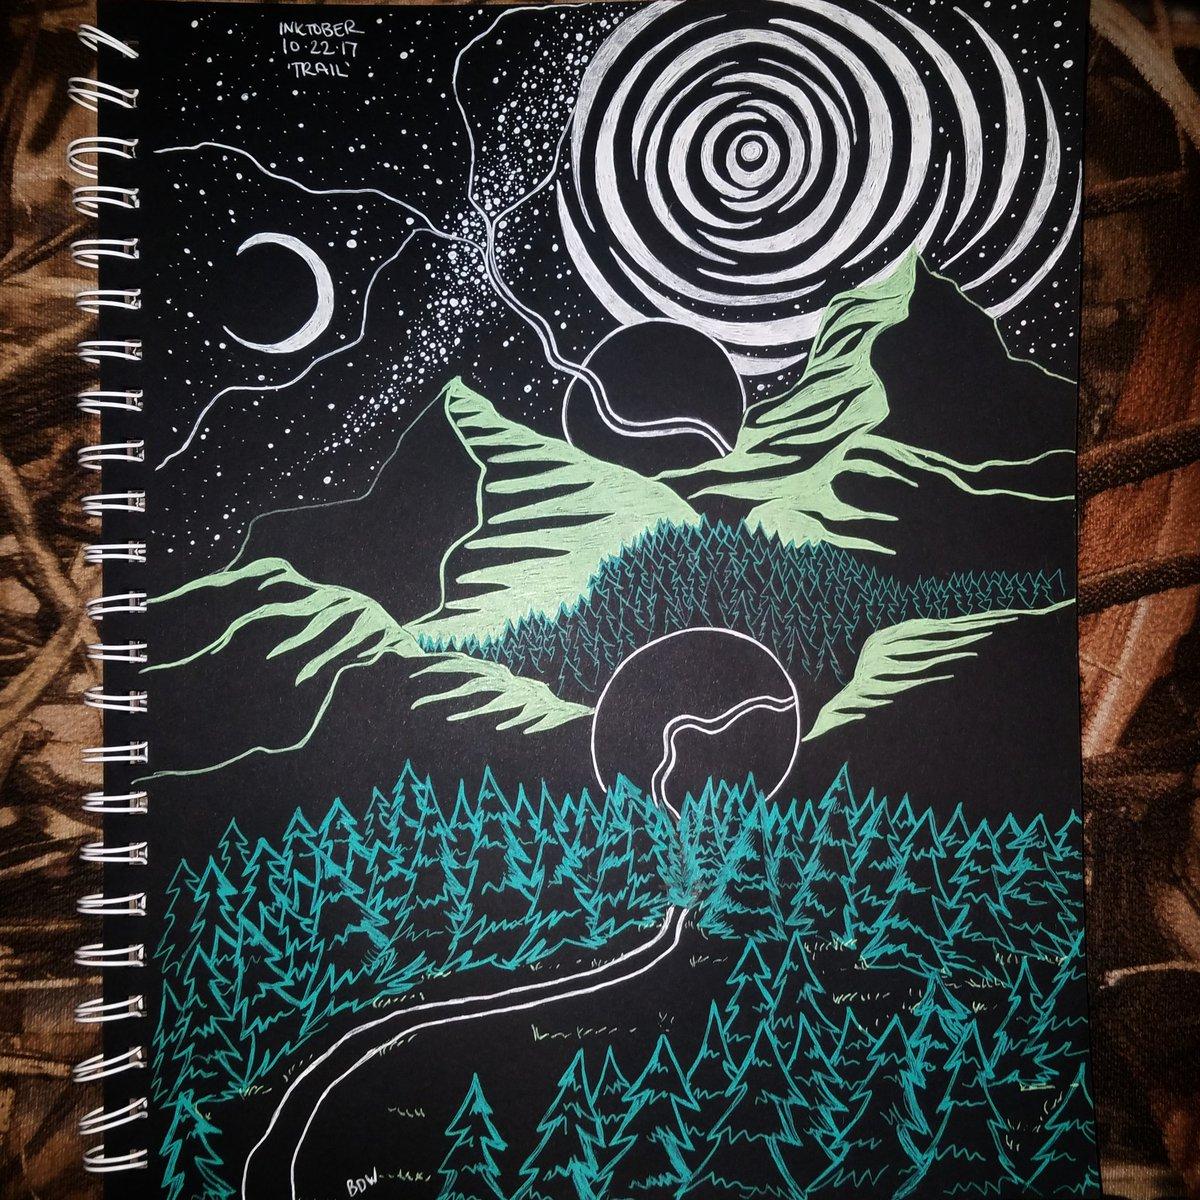 10/22 - Trail